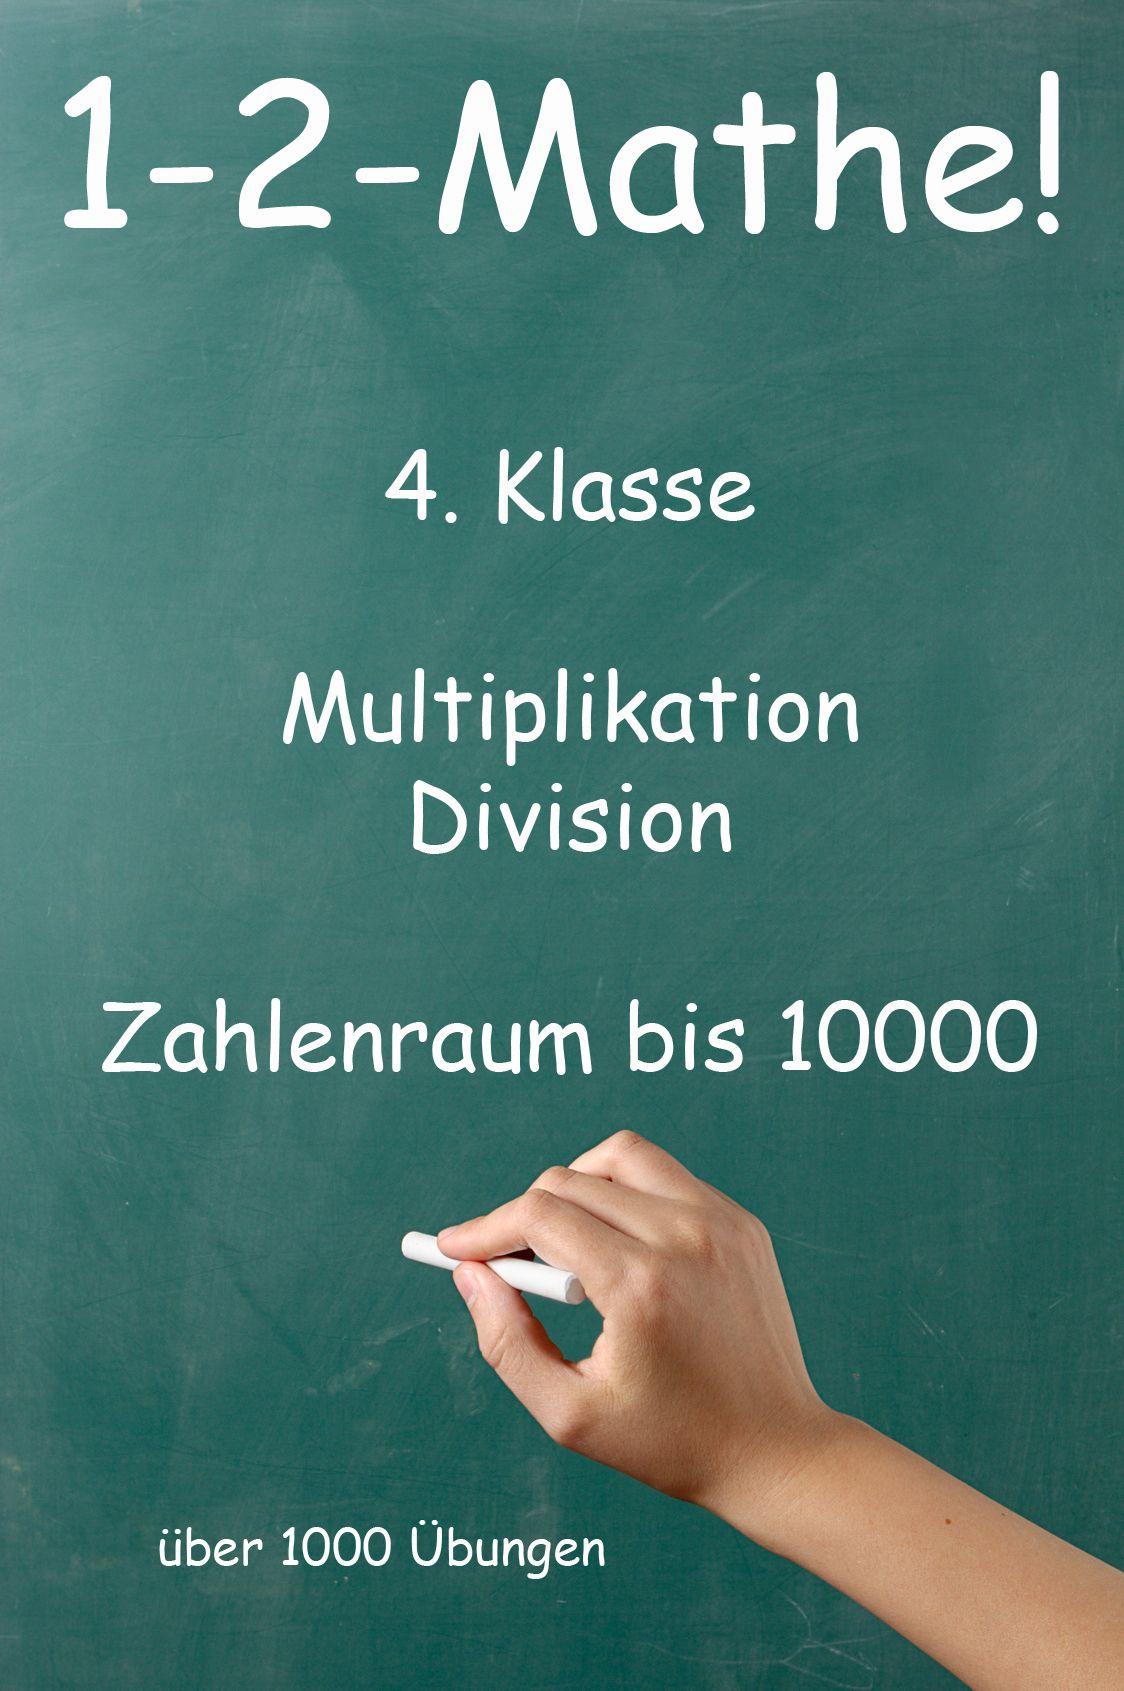 1-2-Mathe! - 4. Klasse - Multiplikation, Division, Zahlenraum bis ...